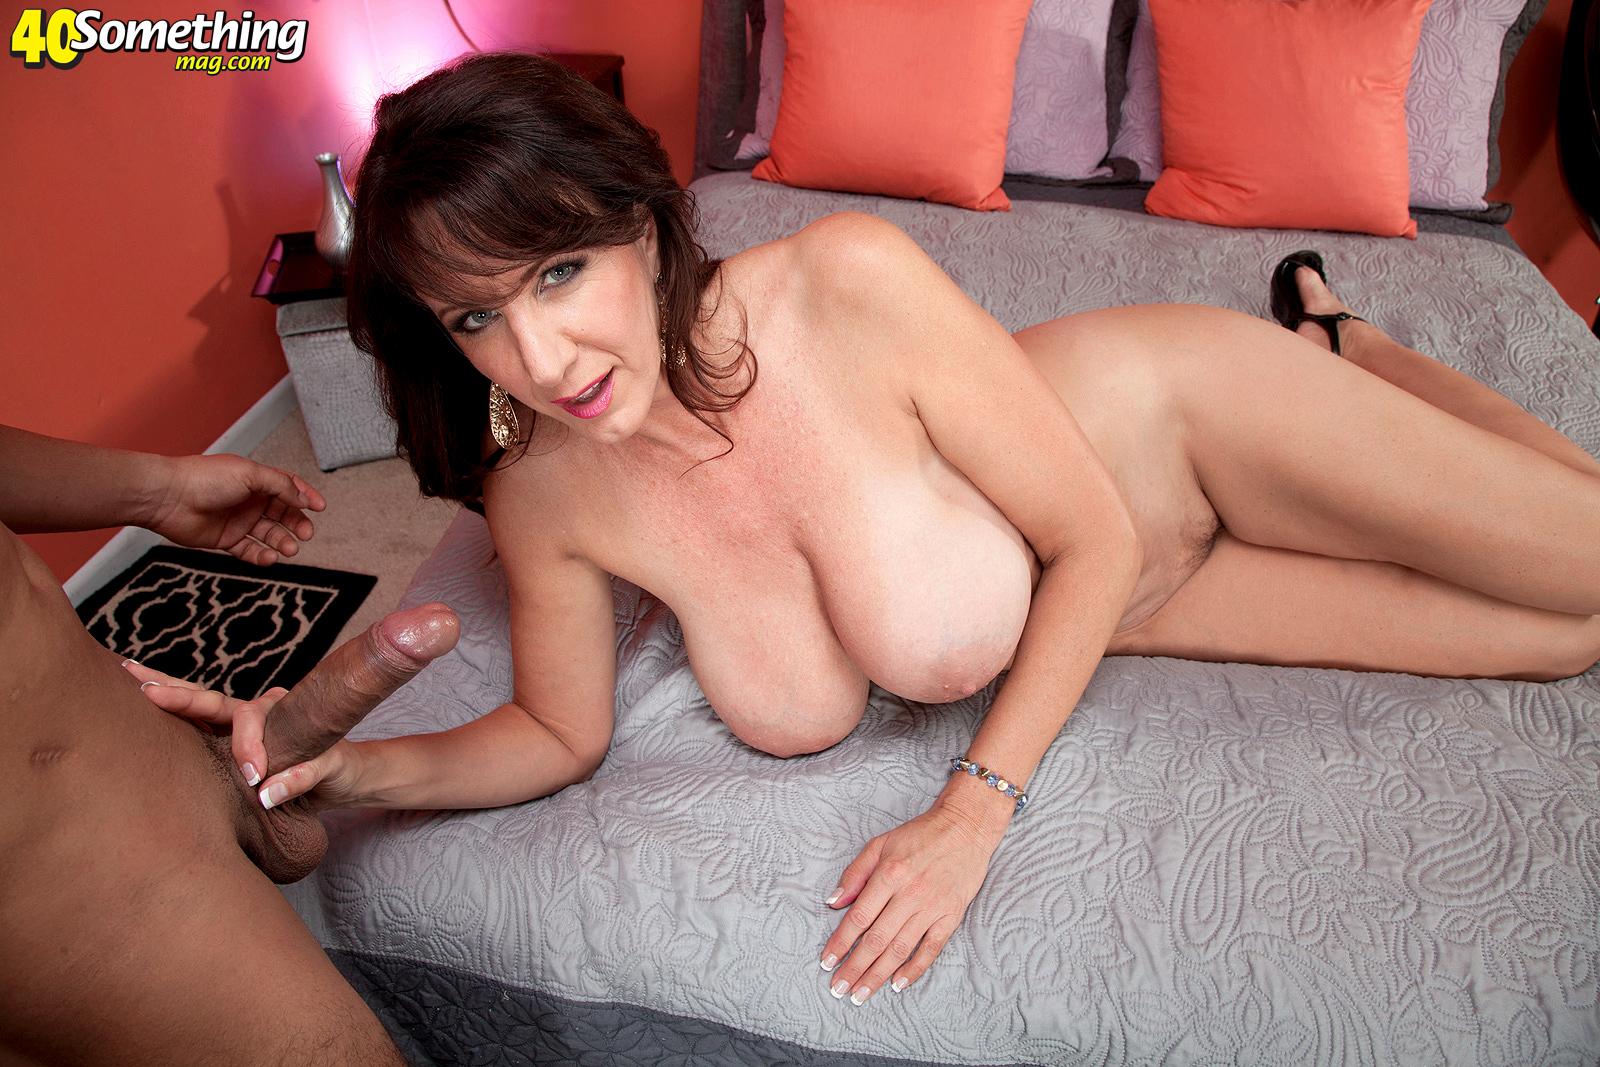 Anna friel nude photos